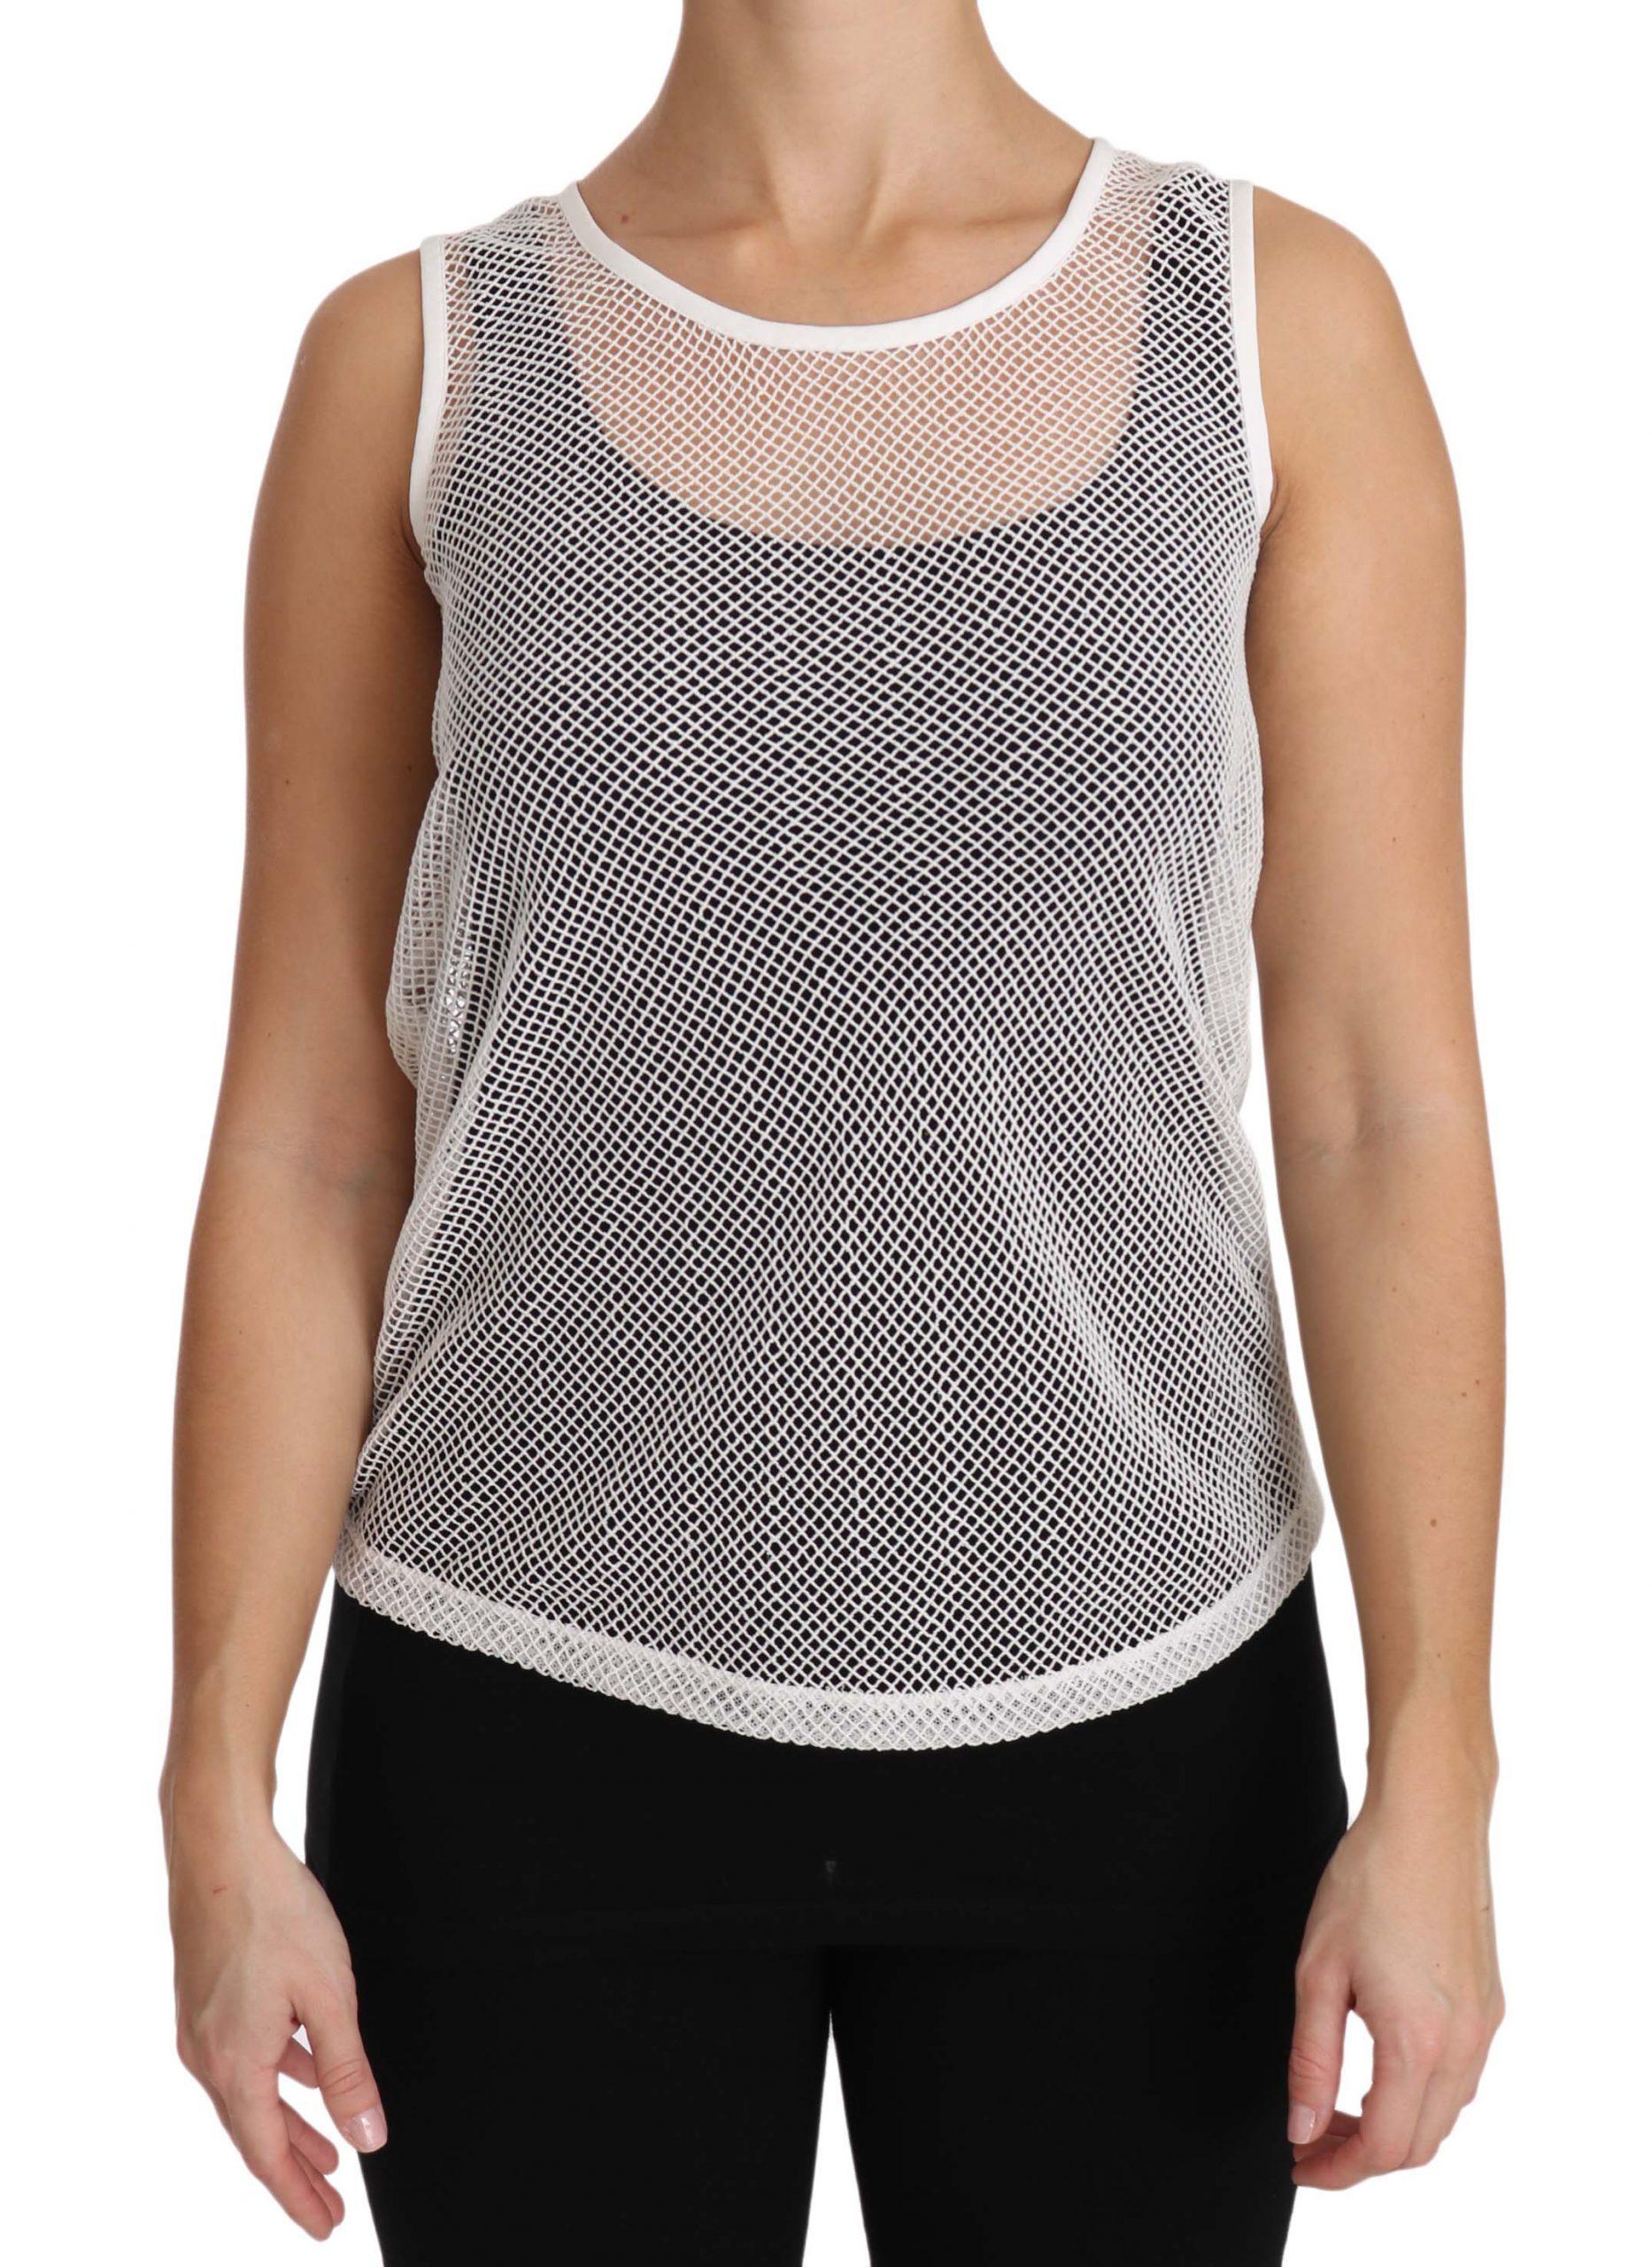 Dolce & Gabbana Women's Net Transparent Tops White TSH2963 - IT36   XS